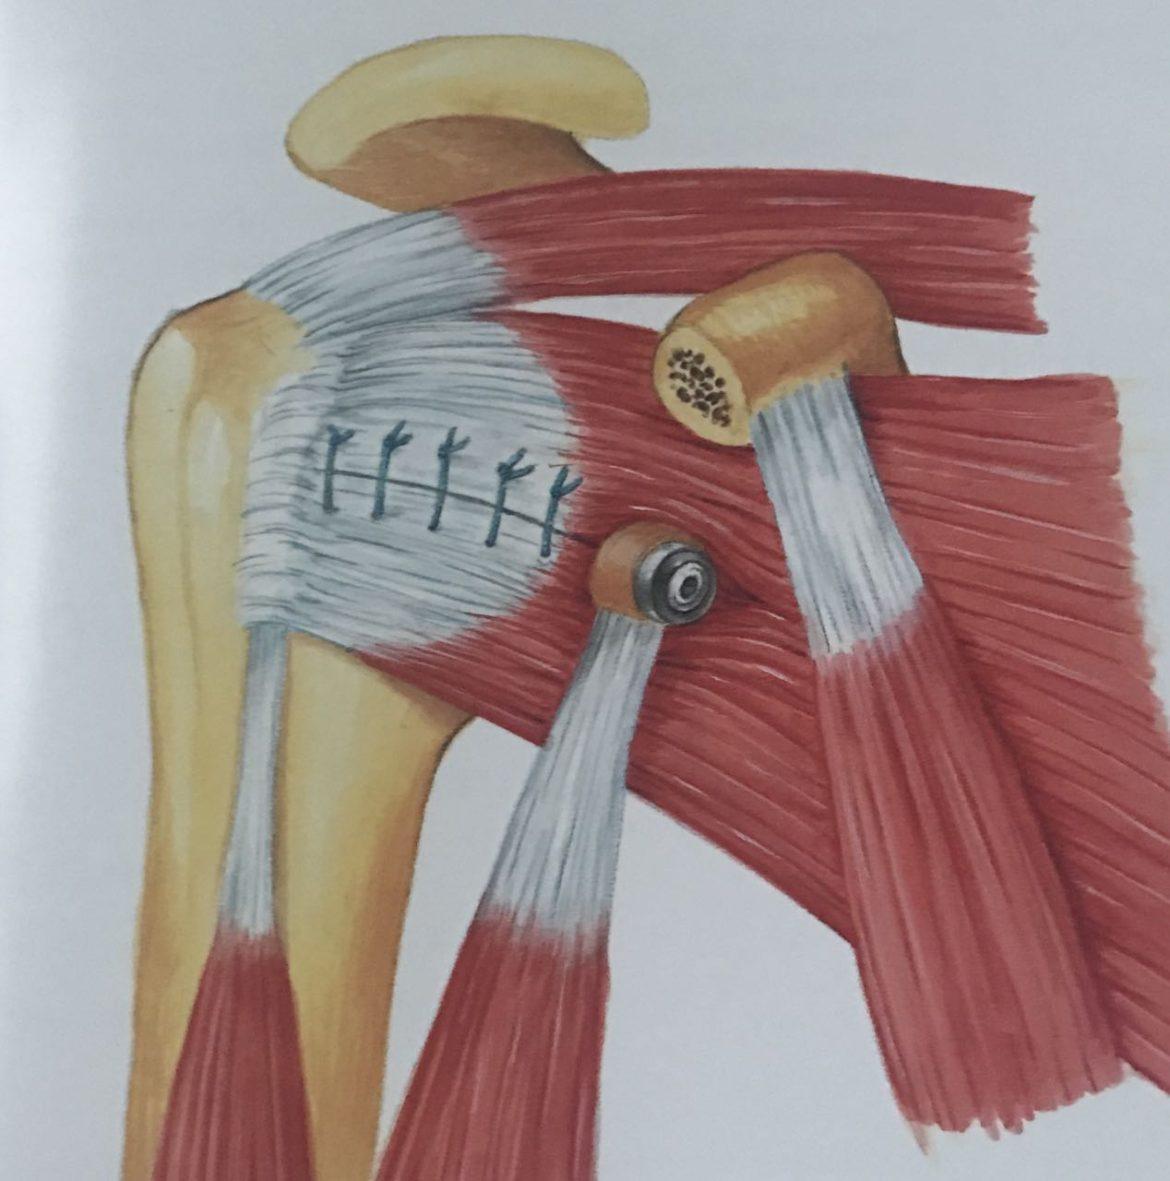 Tecnica de Latarjet para las inestabilidades de hombro tras fracaso del  bankart artroscopico 849301261e59